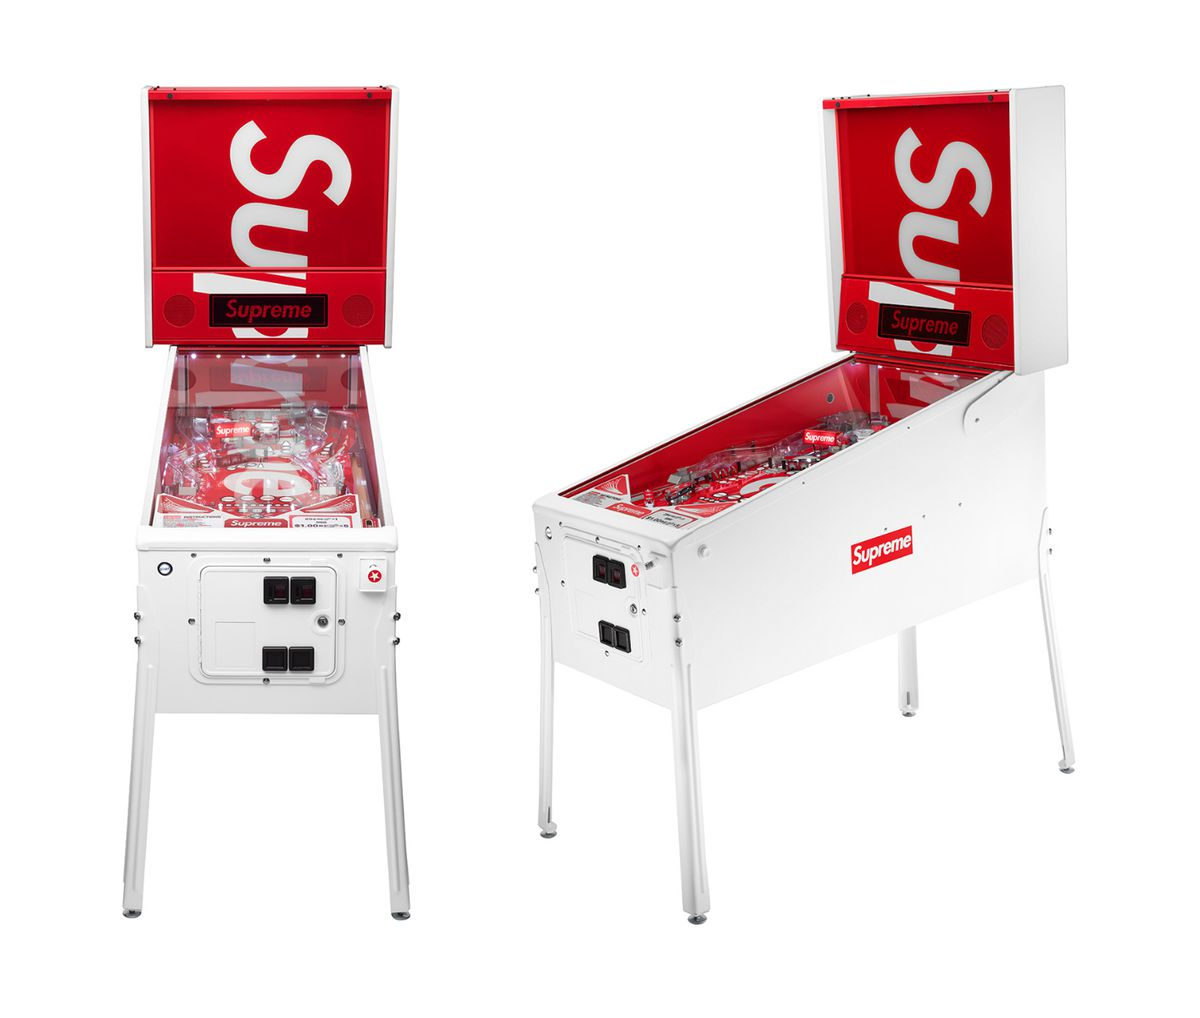 Supreme's Stern pinball machine targets rare demographic of